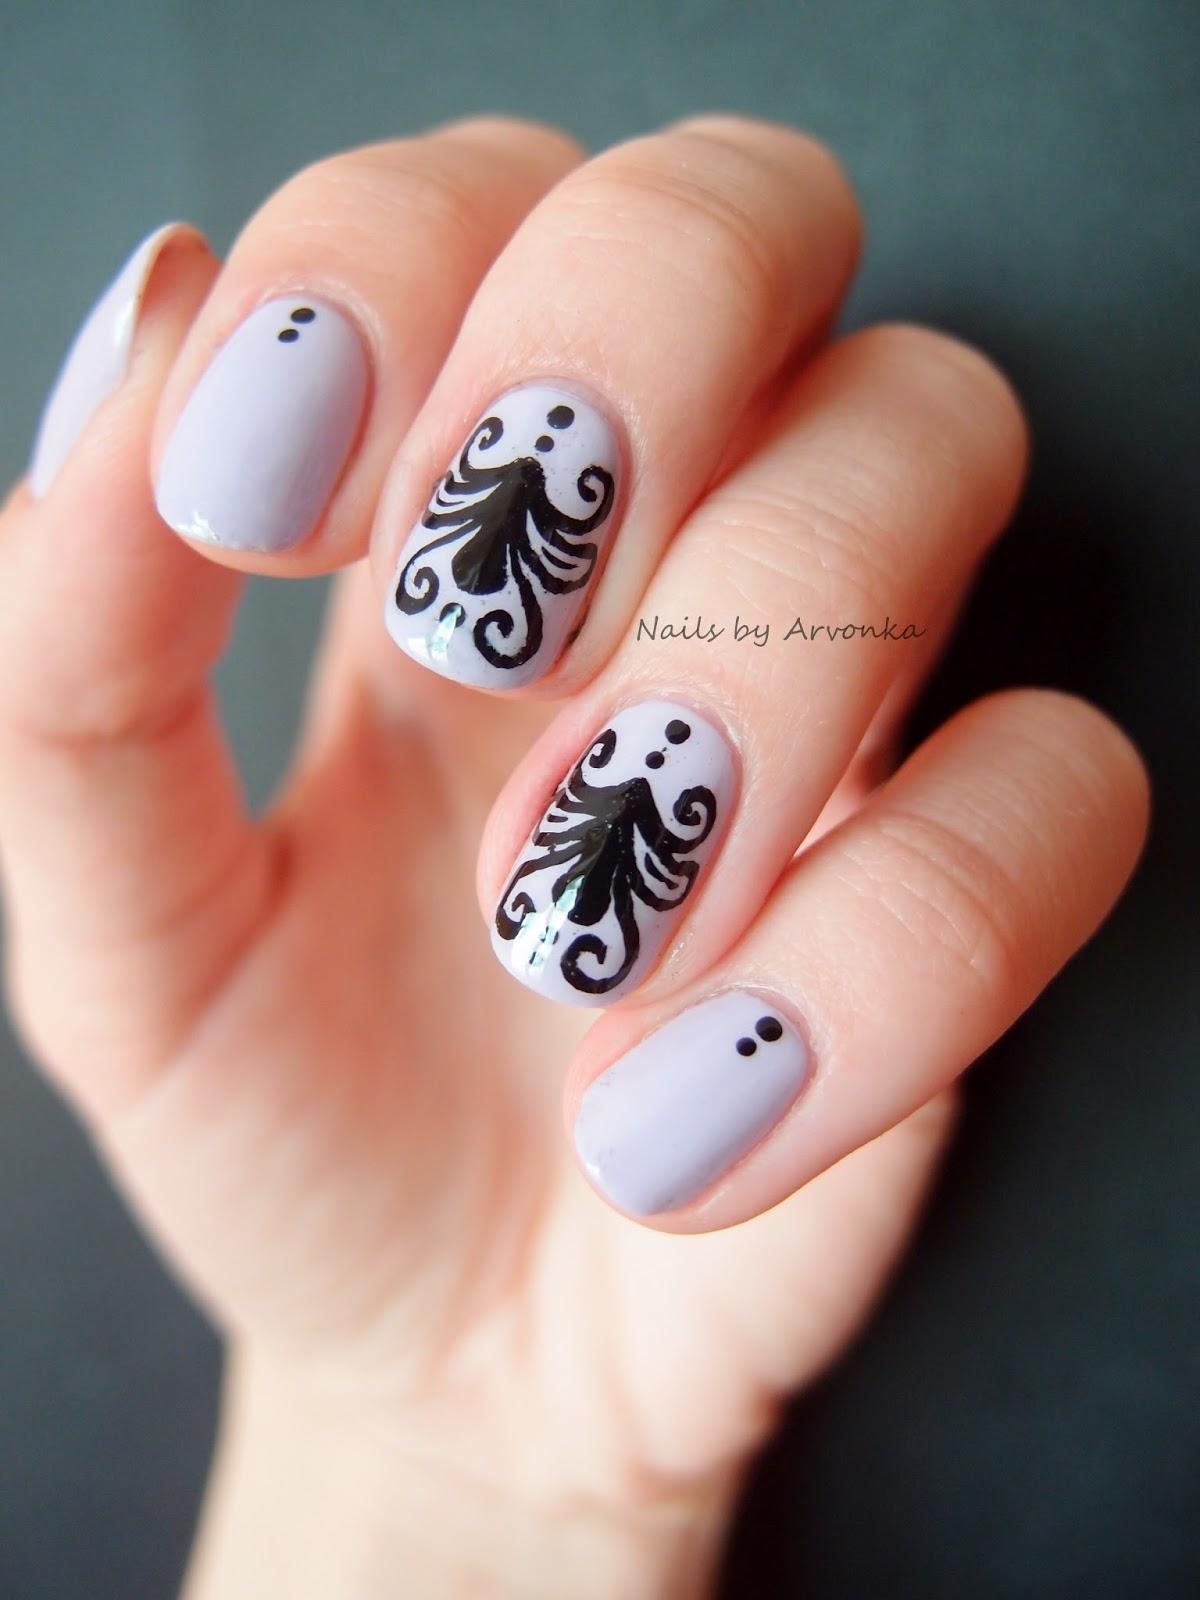 Nails by Arvonka